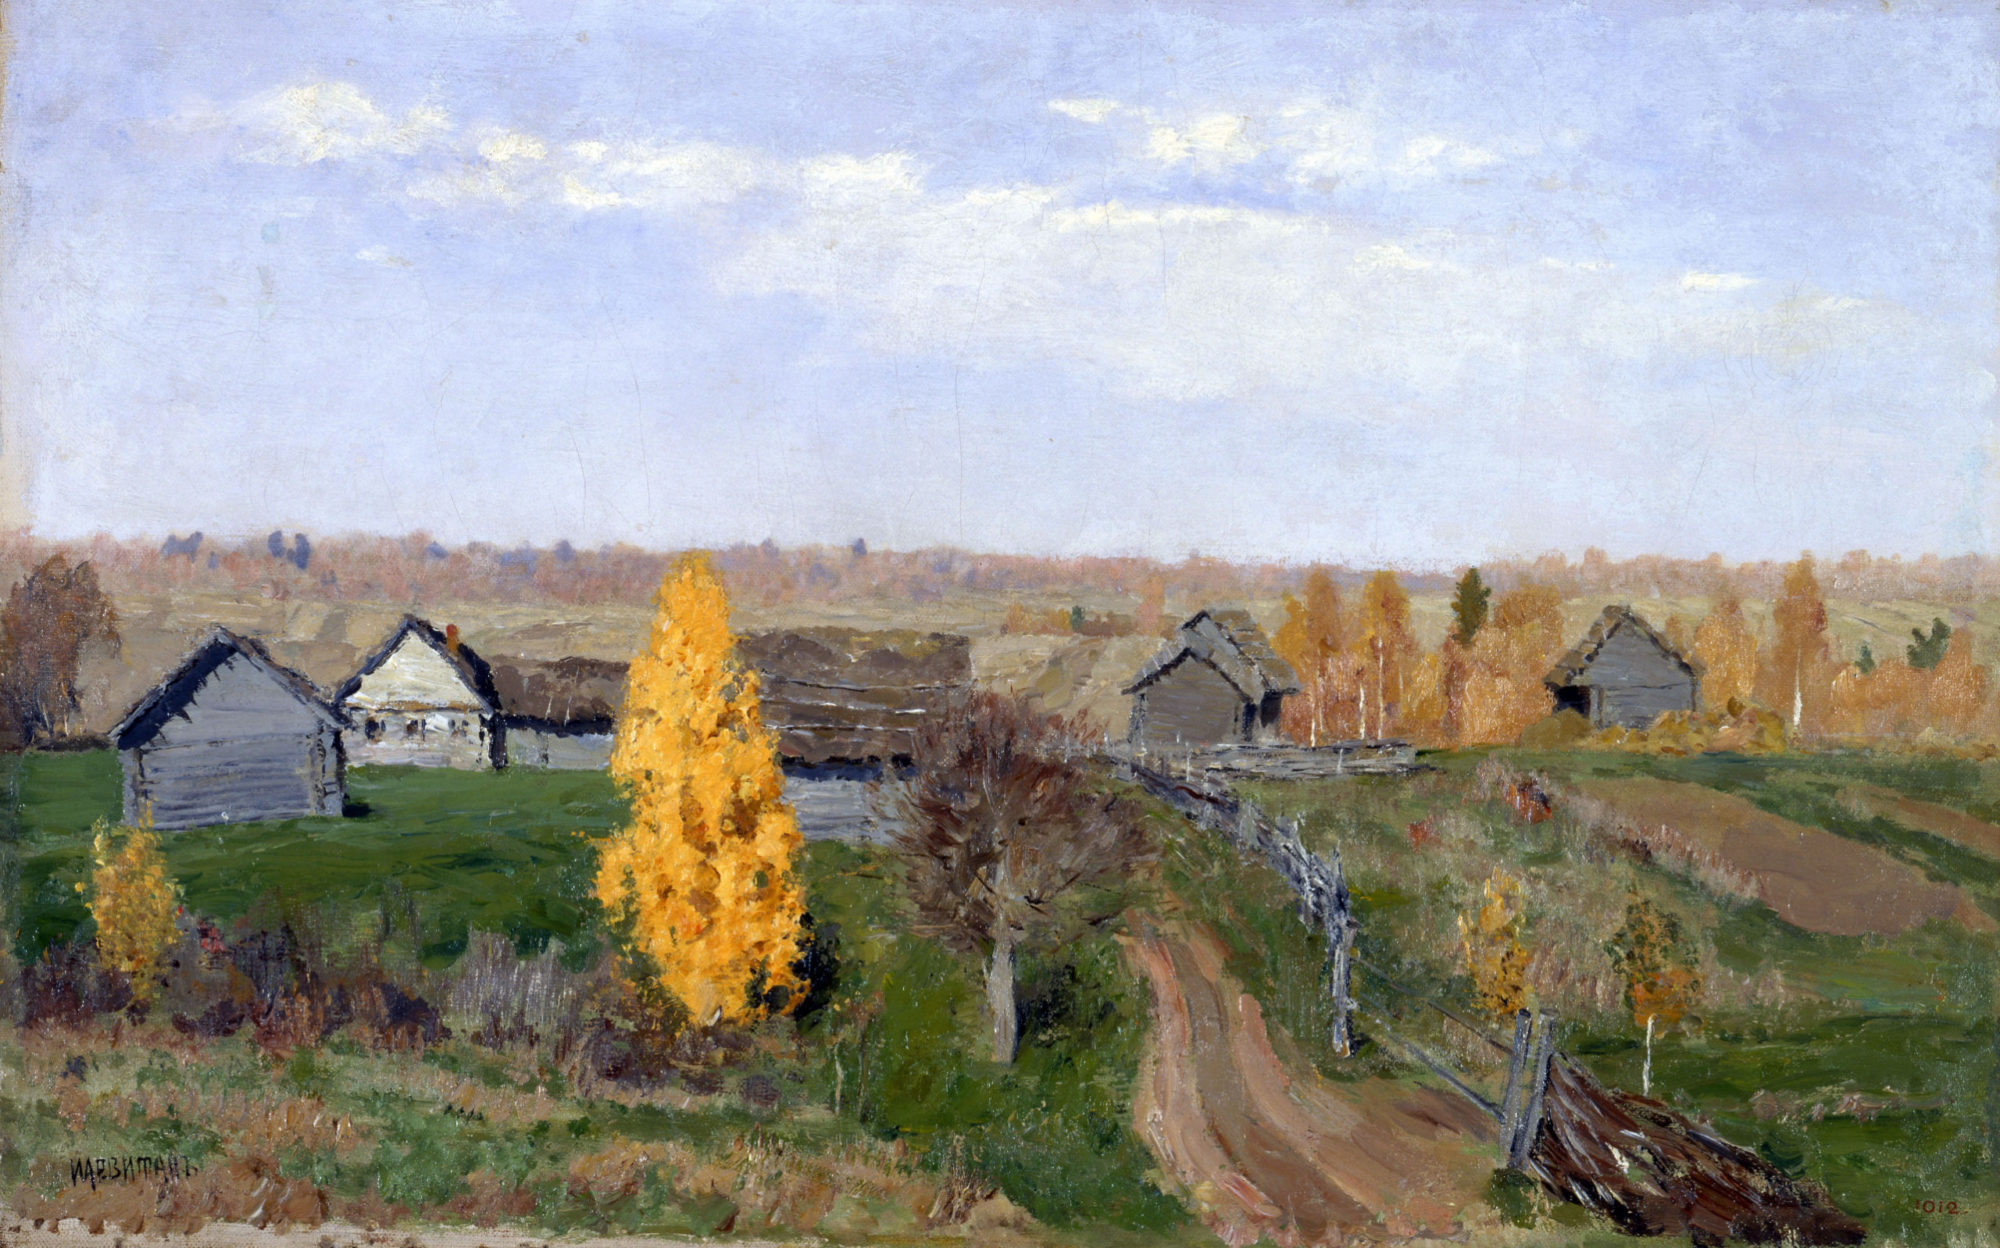 Исаак Левитан, 1889 год, картина «Золотая осень. Слободка».